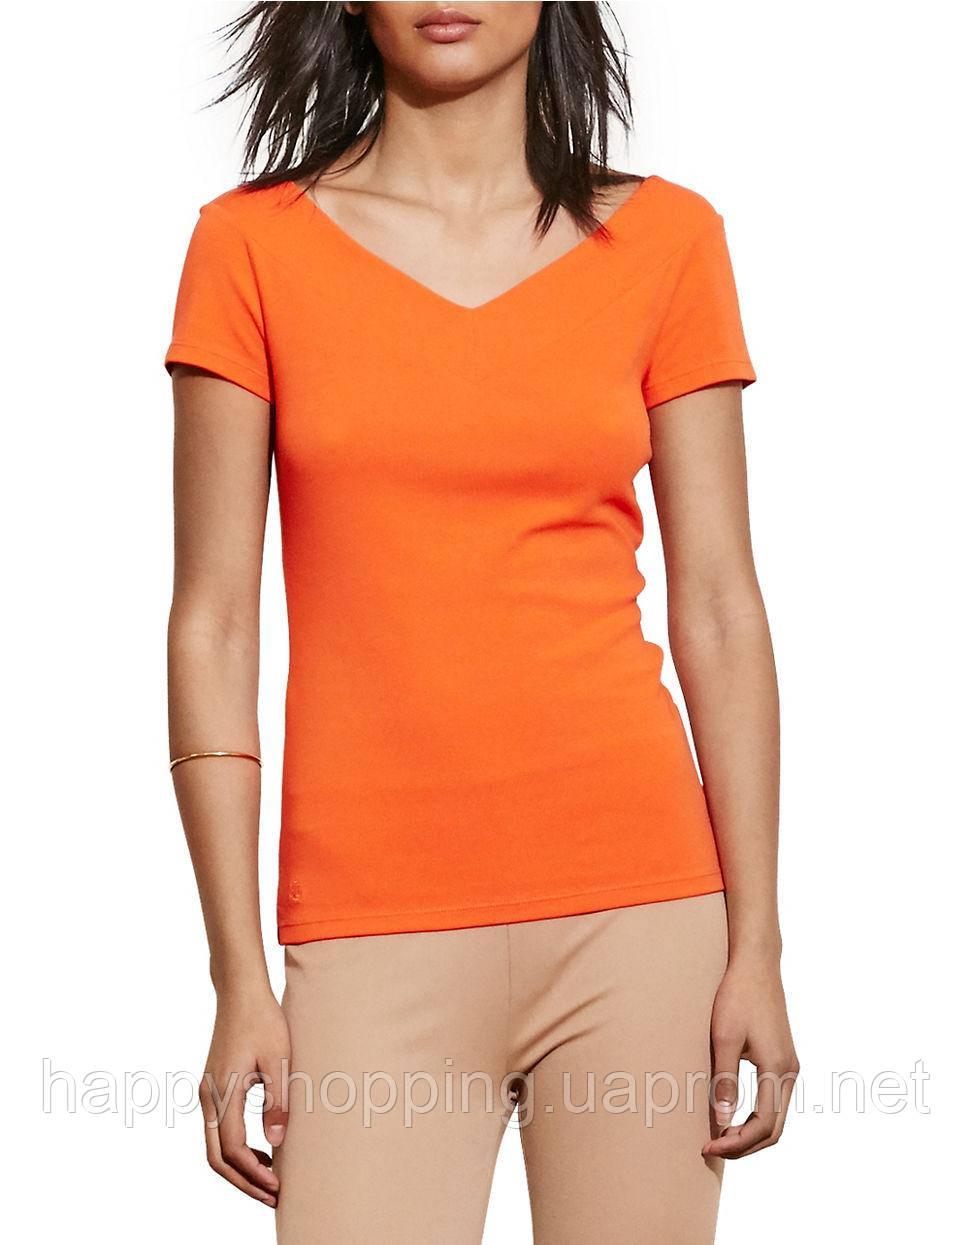 Женская оранжевая футболка Ralph Lauren